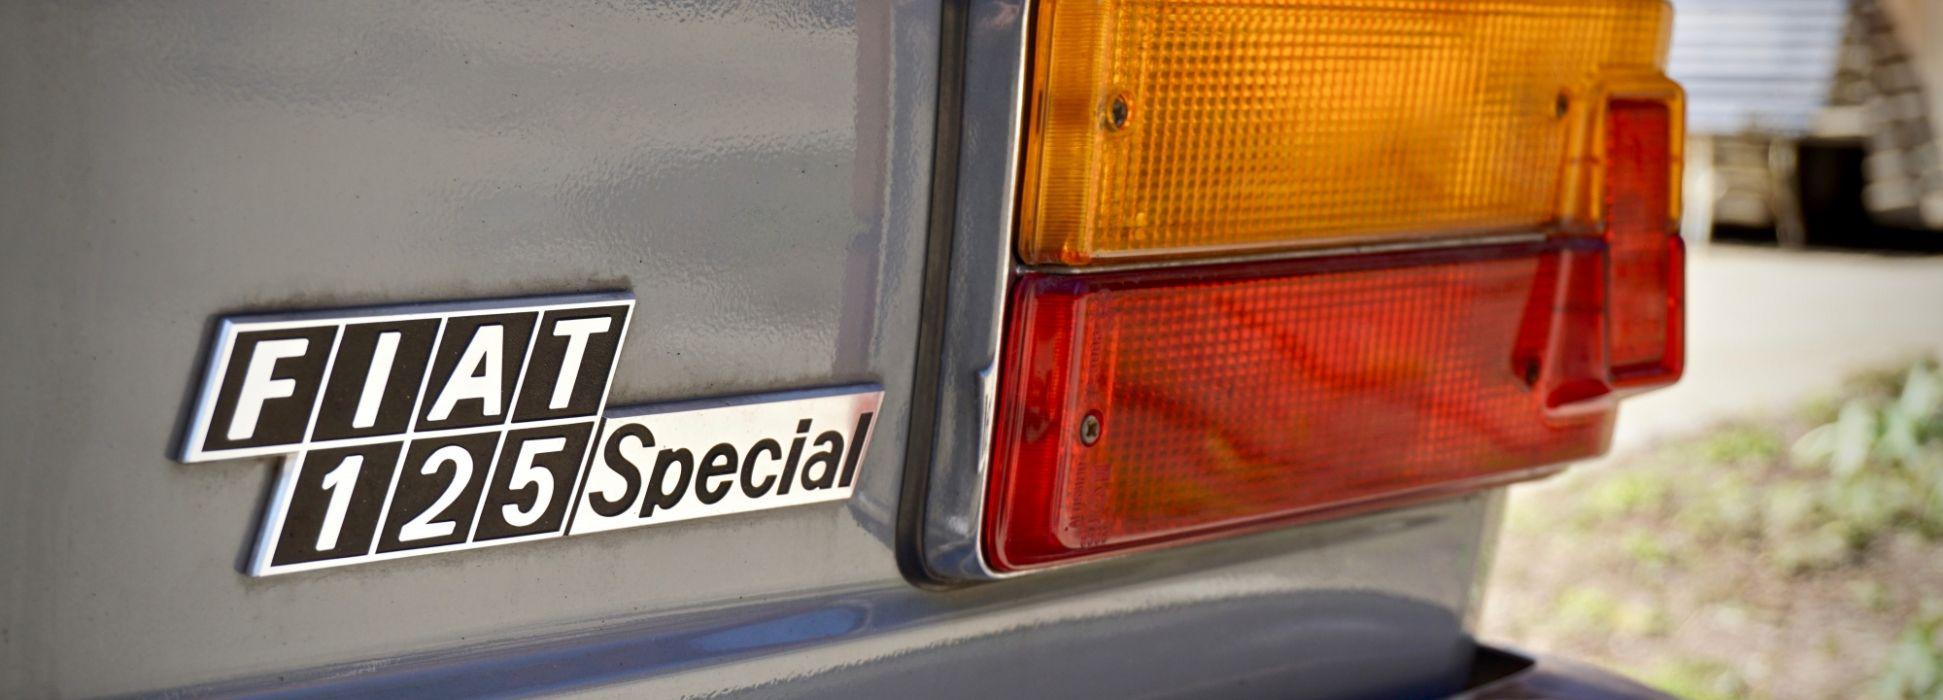 Fiat 125 Special Sportlimousine 16